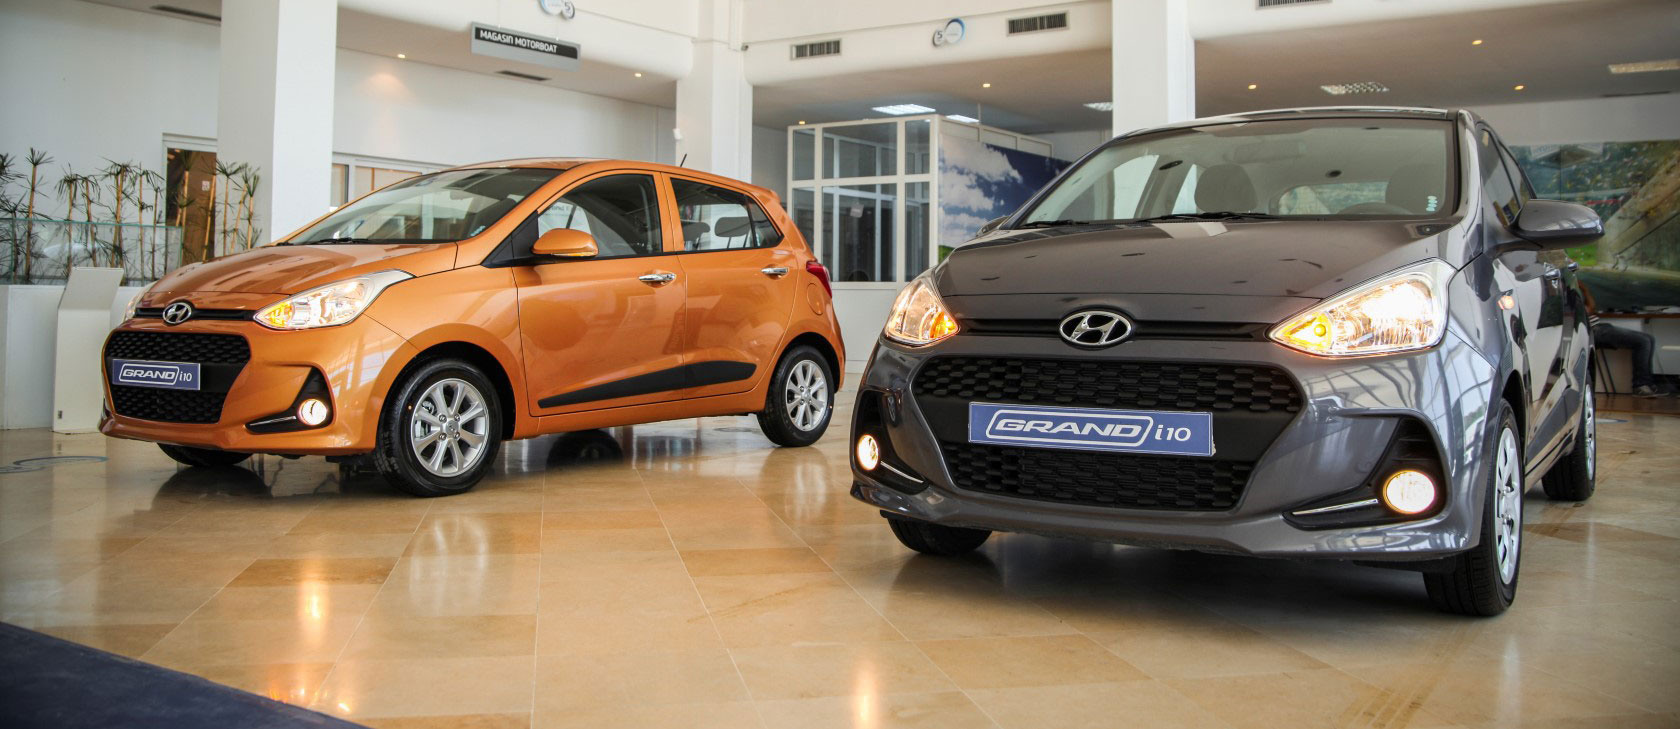 Hyundai Grand i10 restylé chez Alpha Hyundai Motors